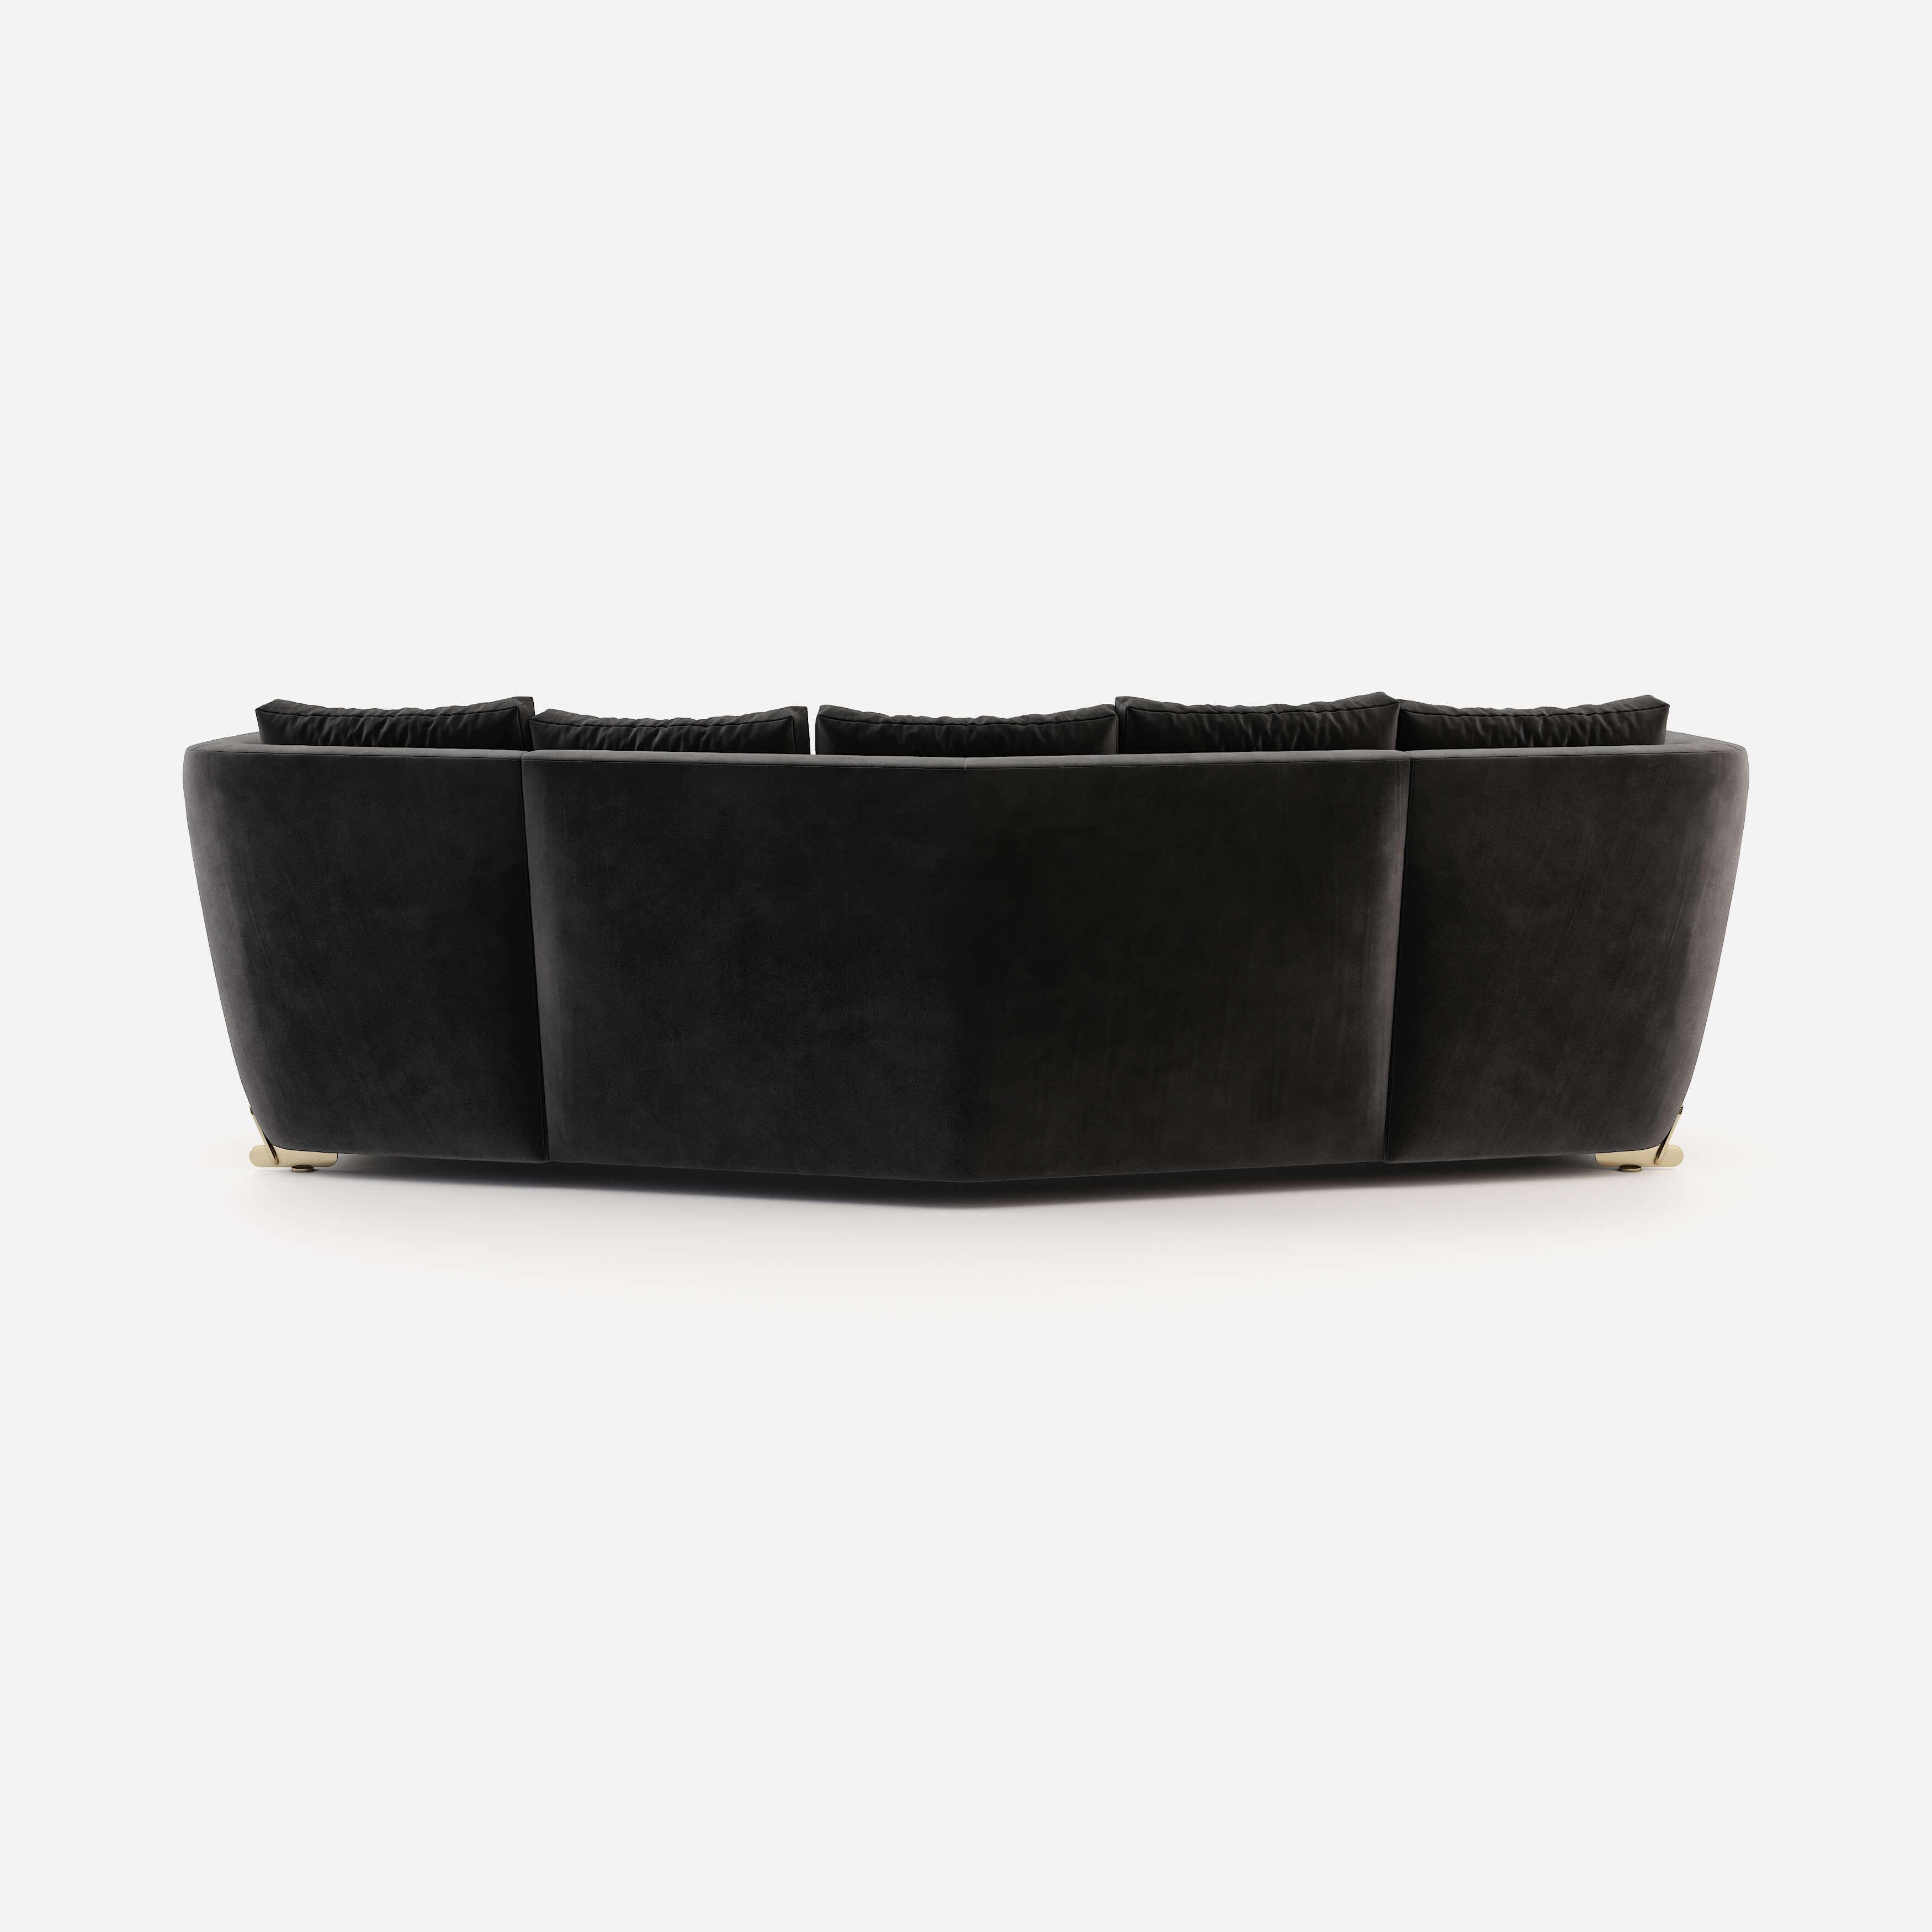 Xena Sofa By Domkapa Capital Collection Design Meets Comfort